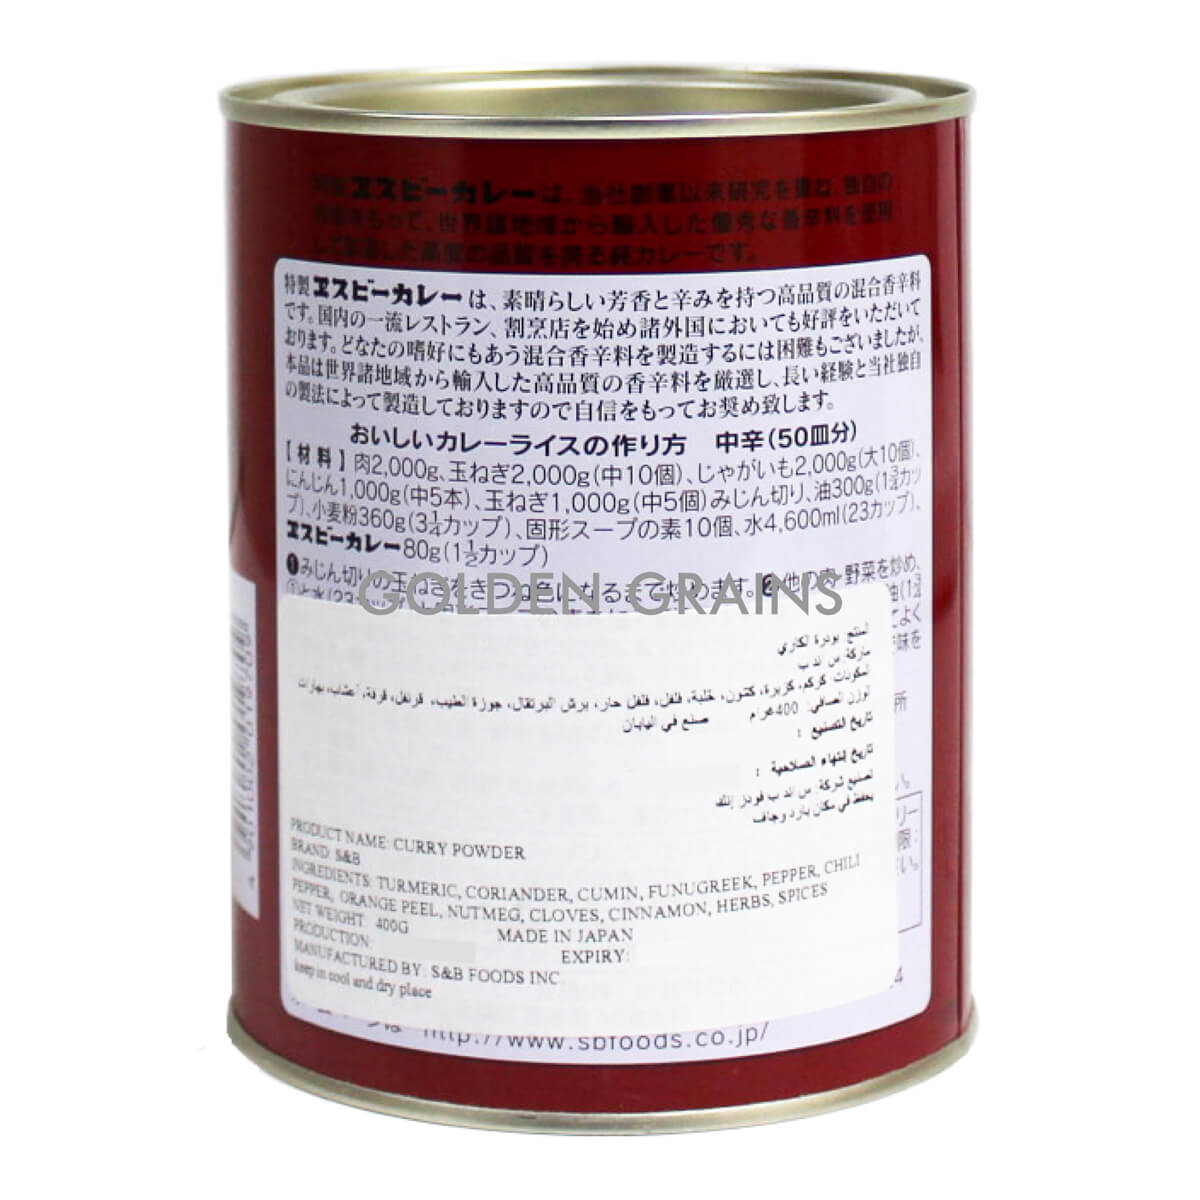 Golden Grains S&B - Spicy Curry Powder - Back.jpg